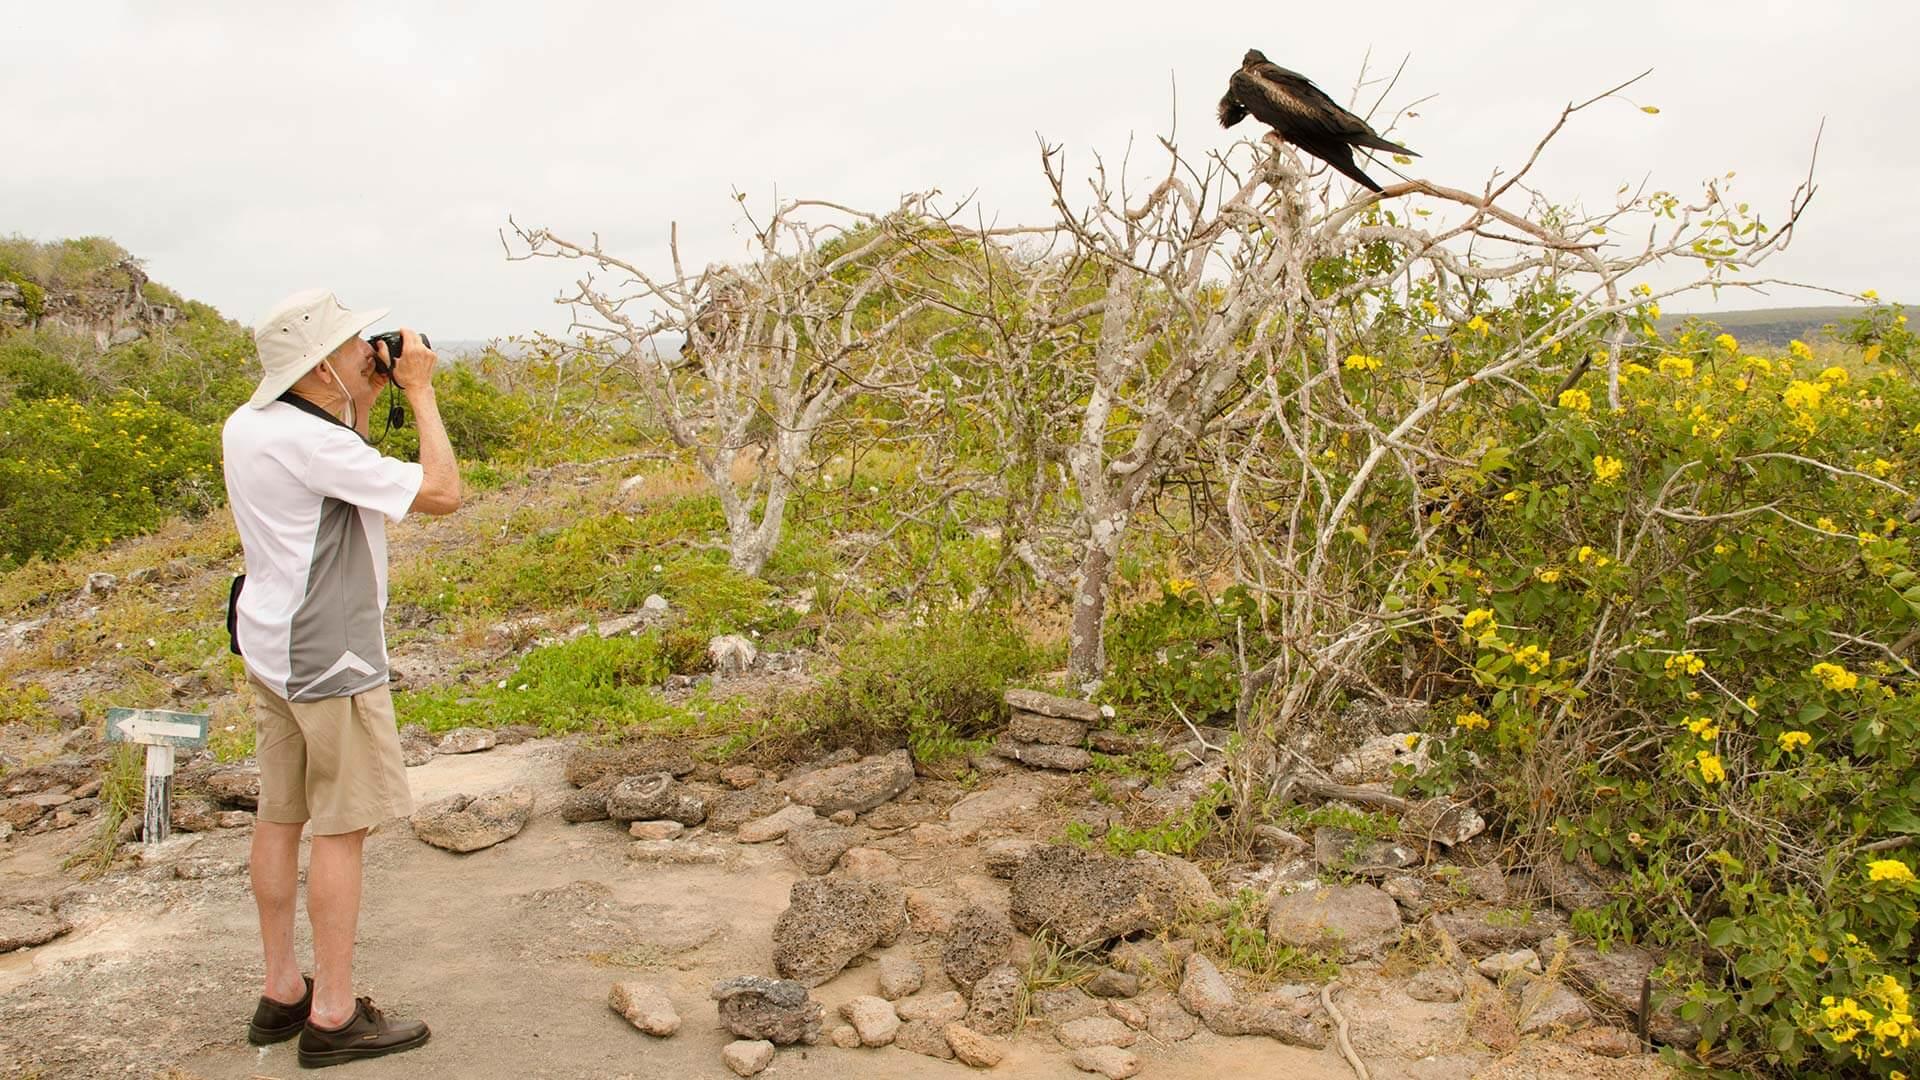 tourist photographs a frigate bird on a galapagos island hopping tour